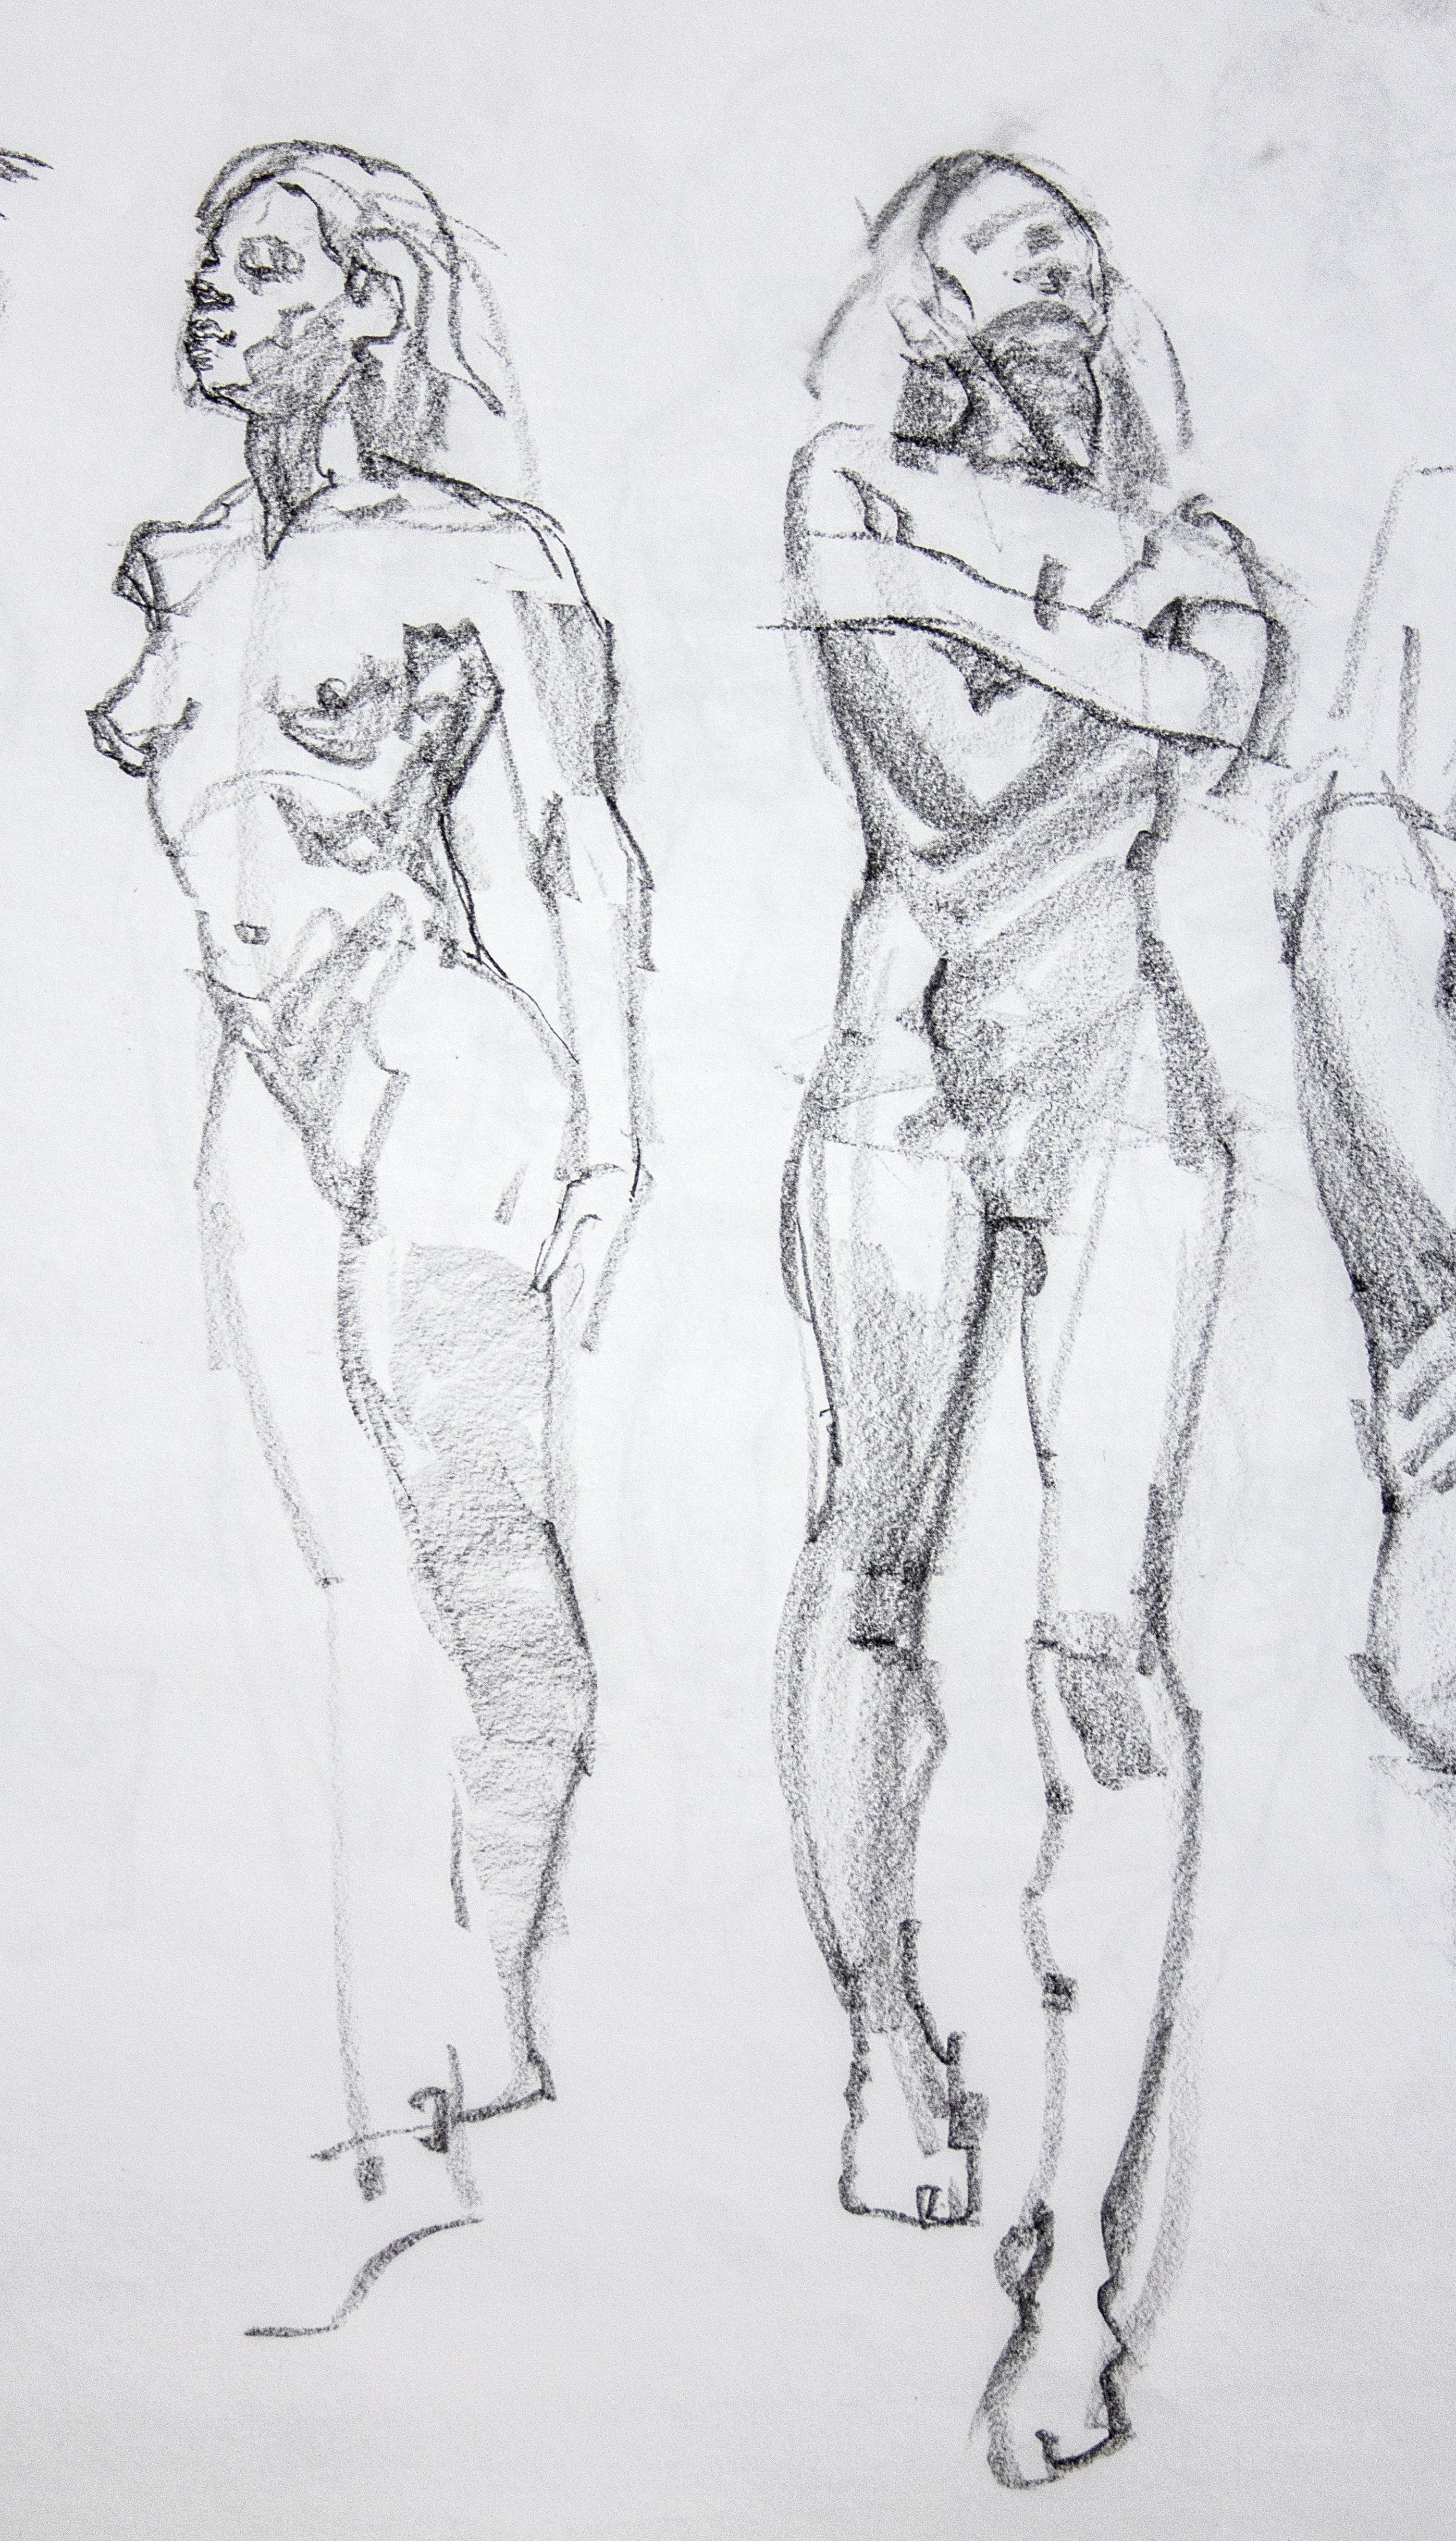 Gestures Standing Woman - Pencil